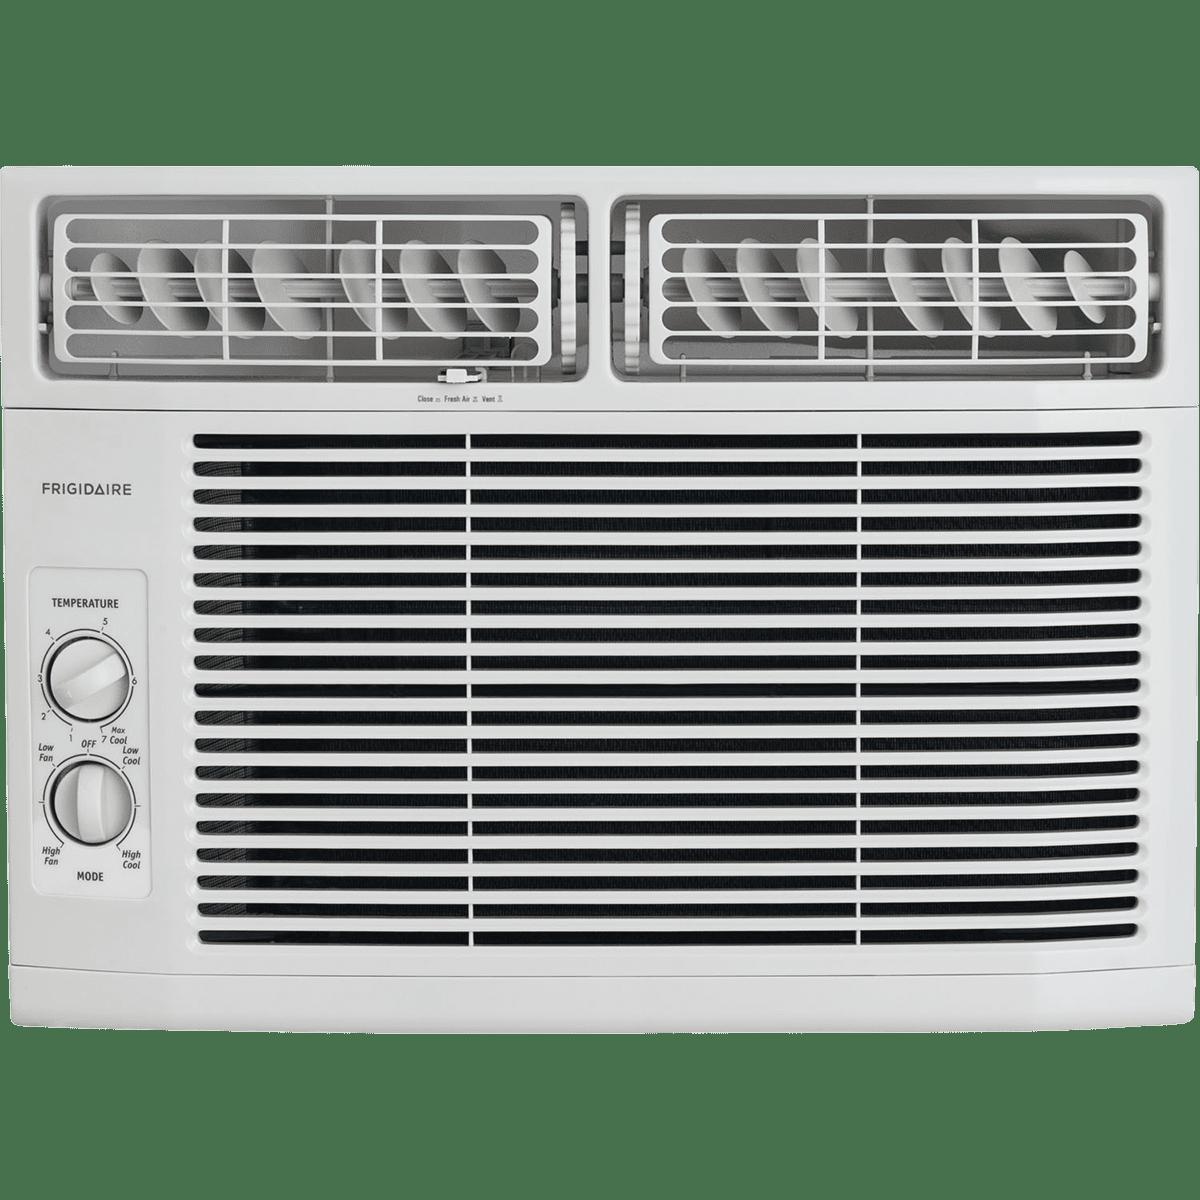 Frigidaire FFRA1011R1 115 V 10,000 BTU Window Air Conditioner